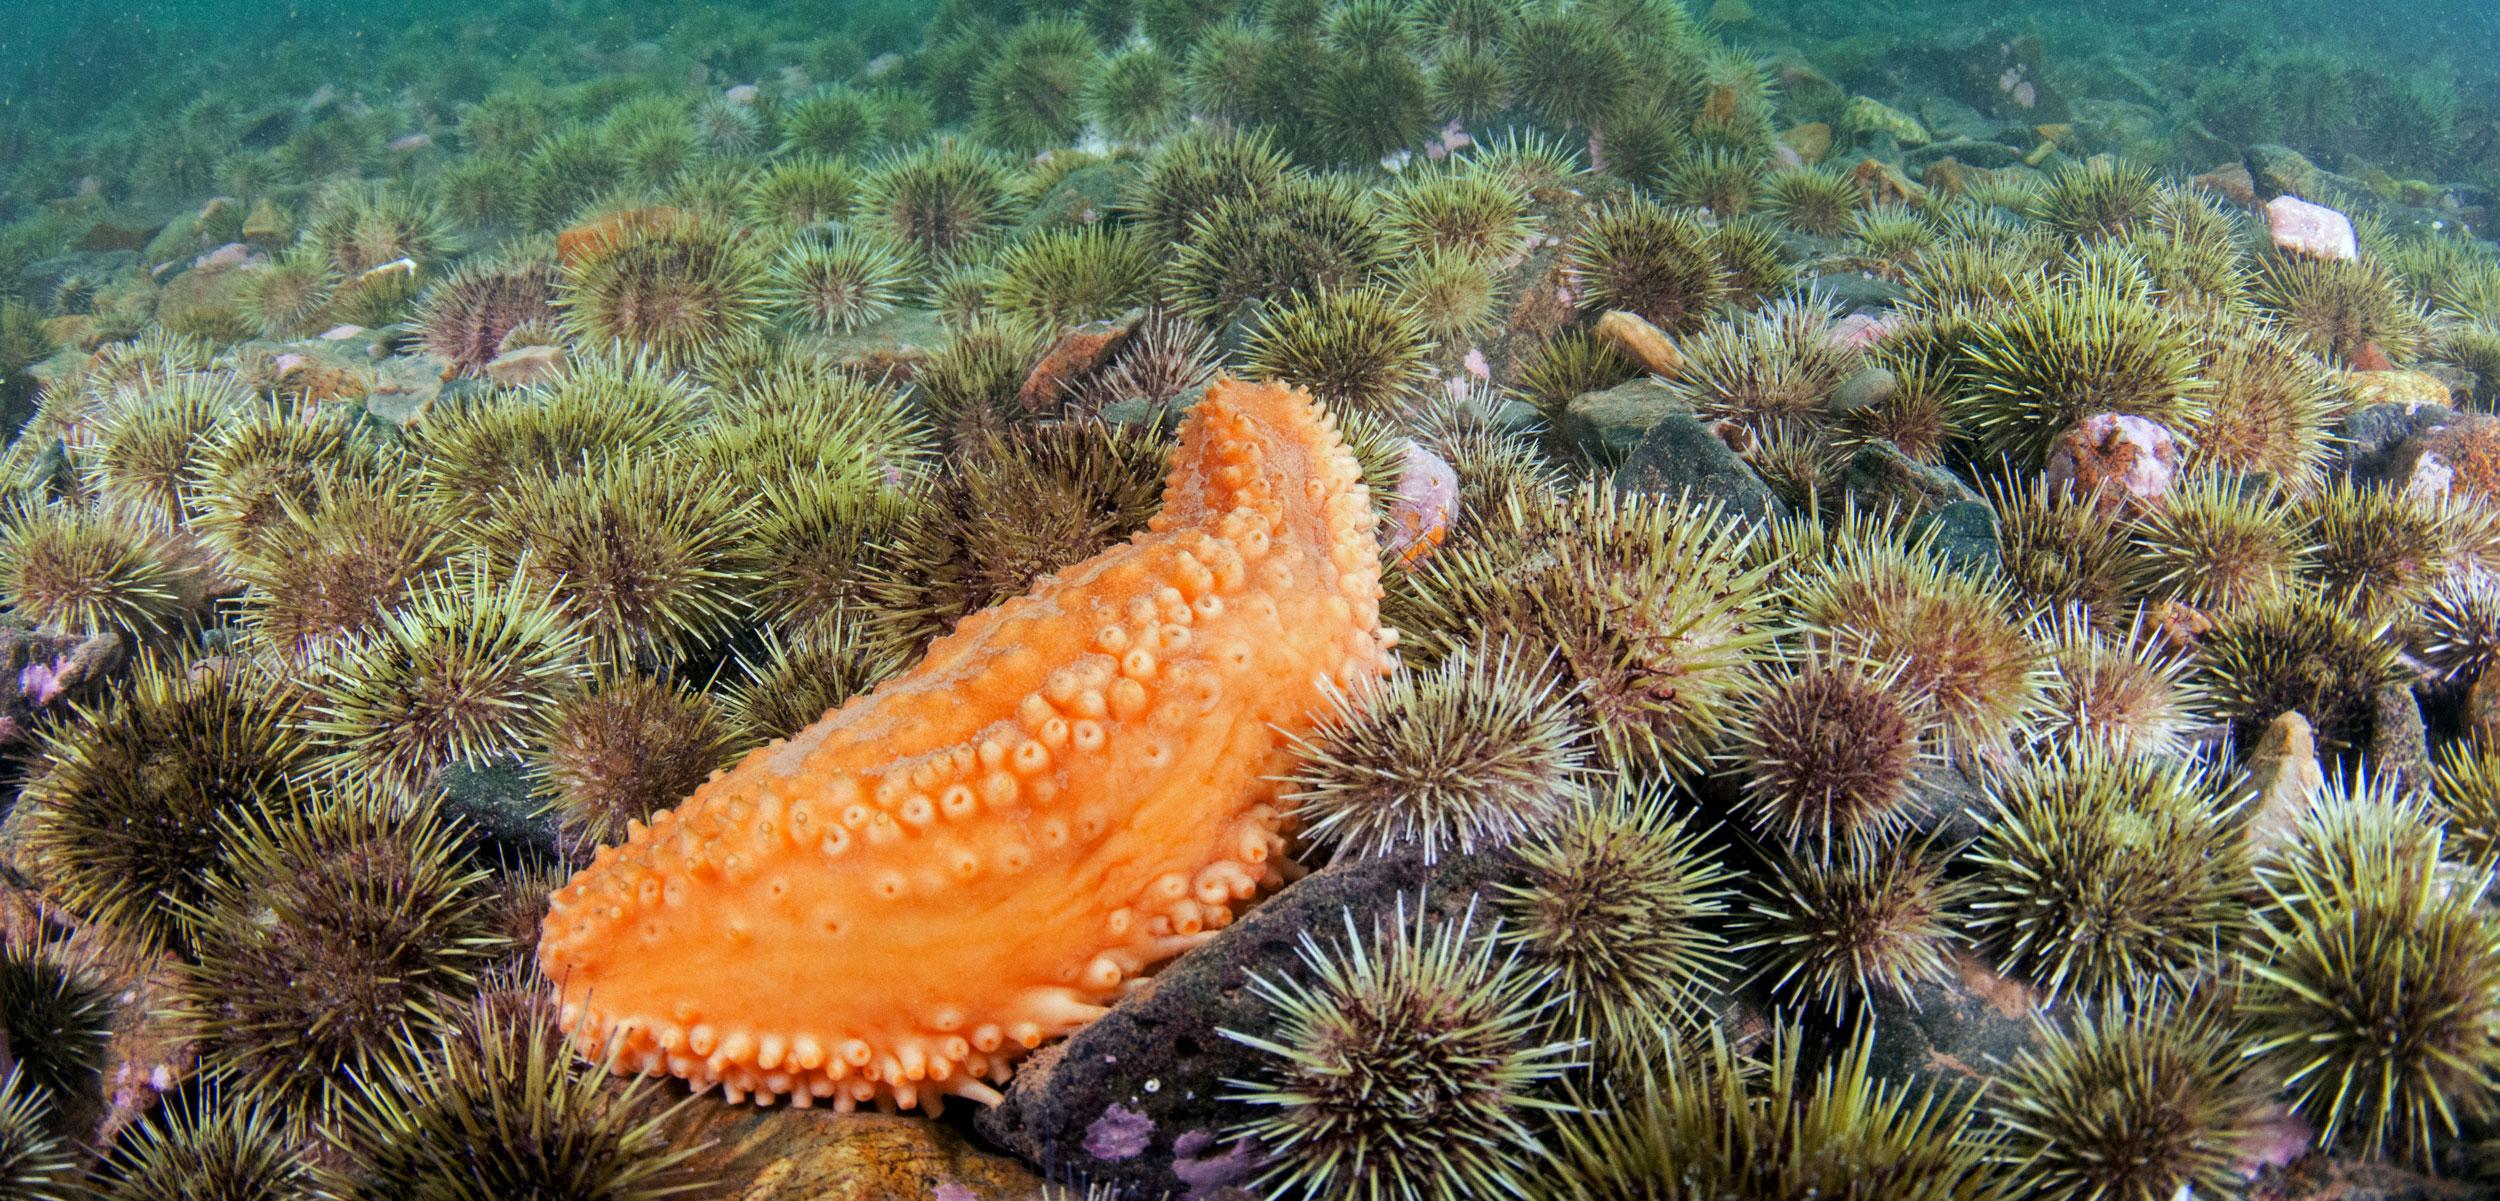 header-sea-cucumbers-1.jpg